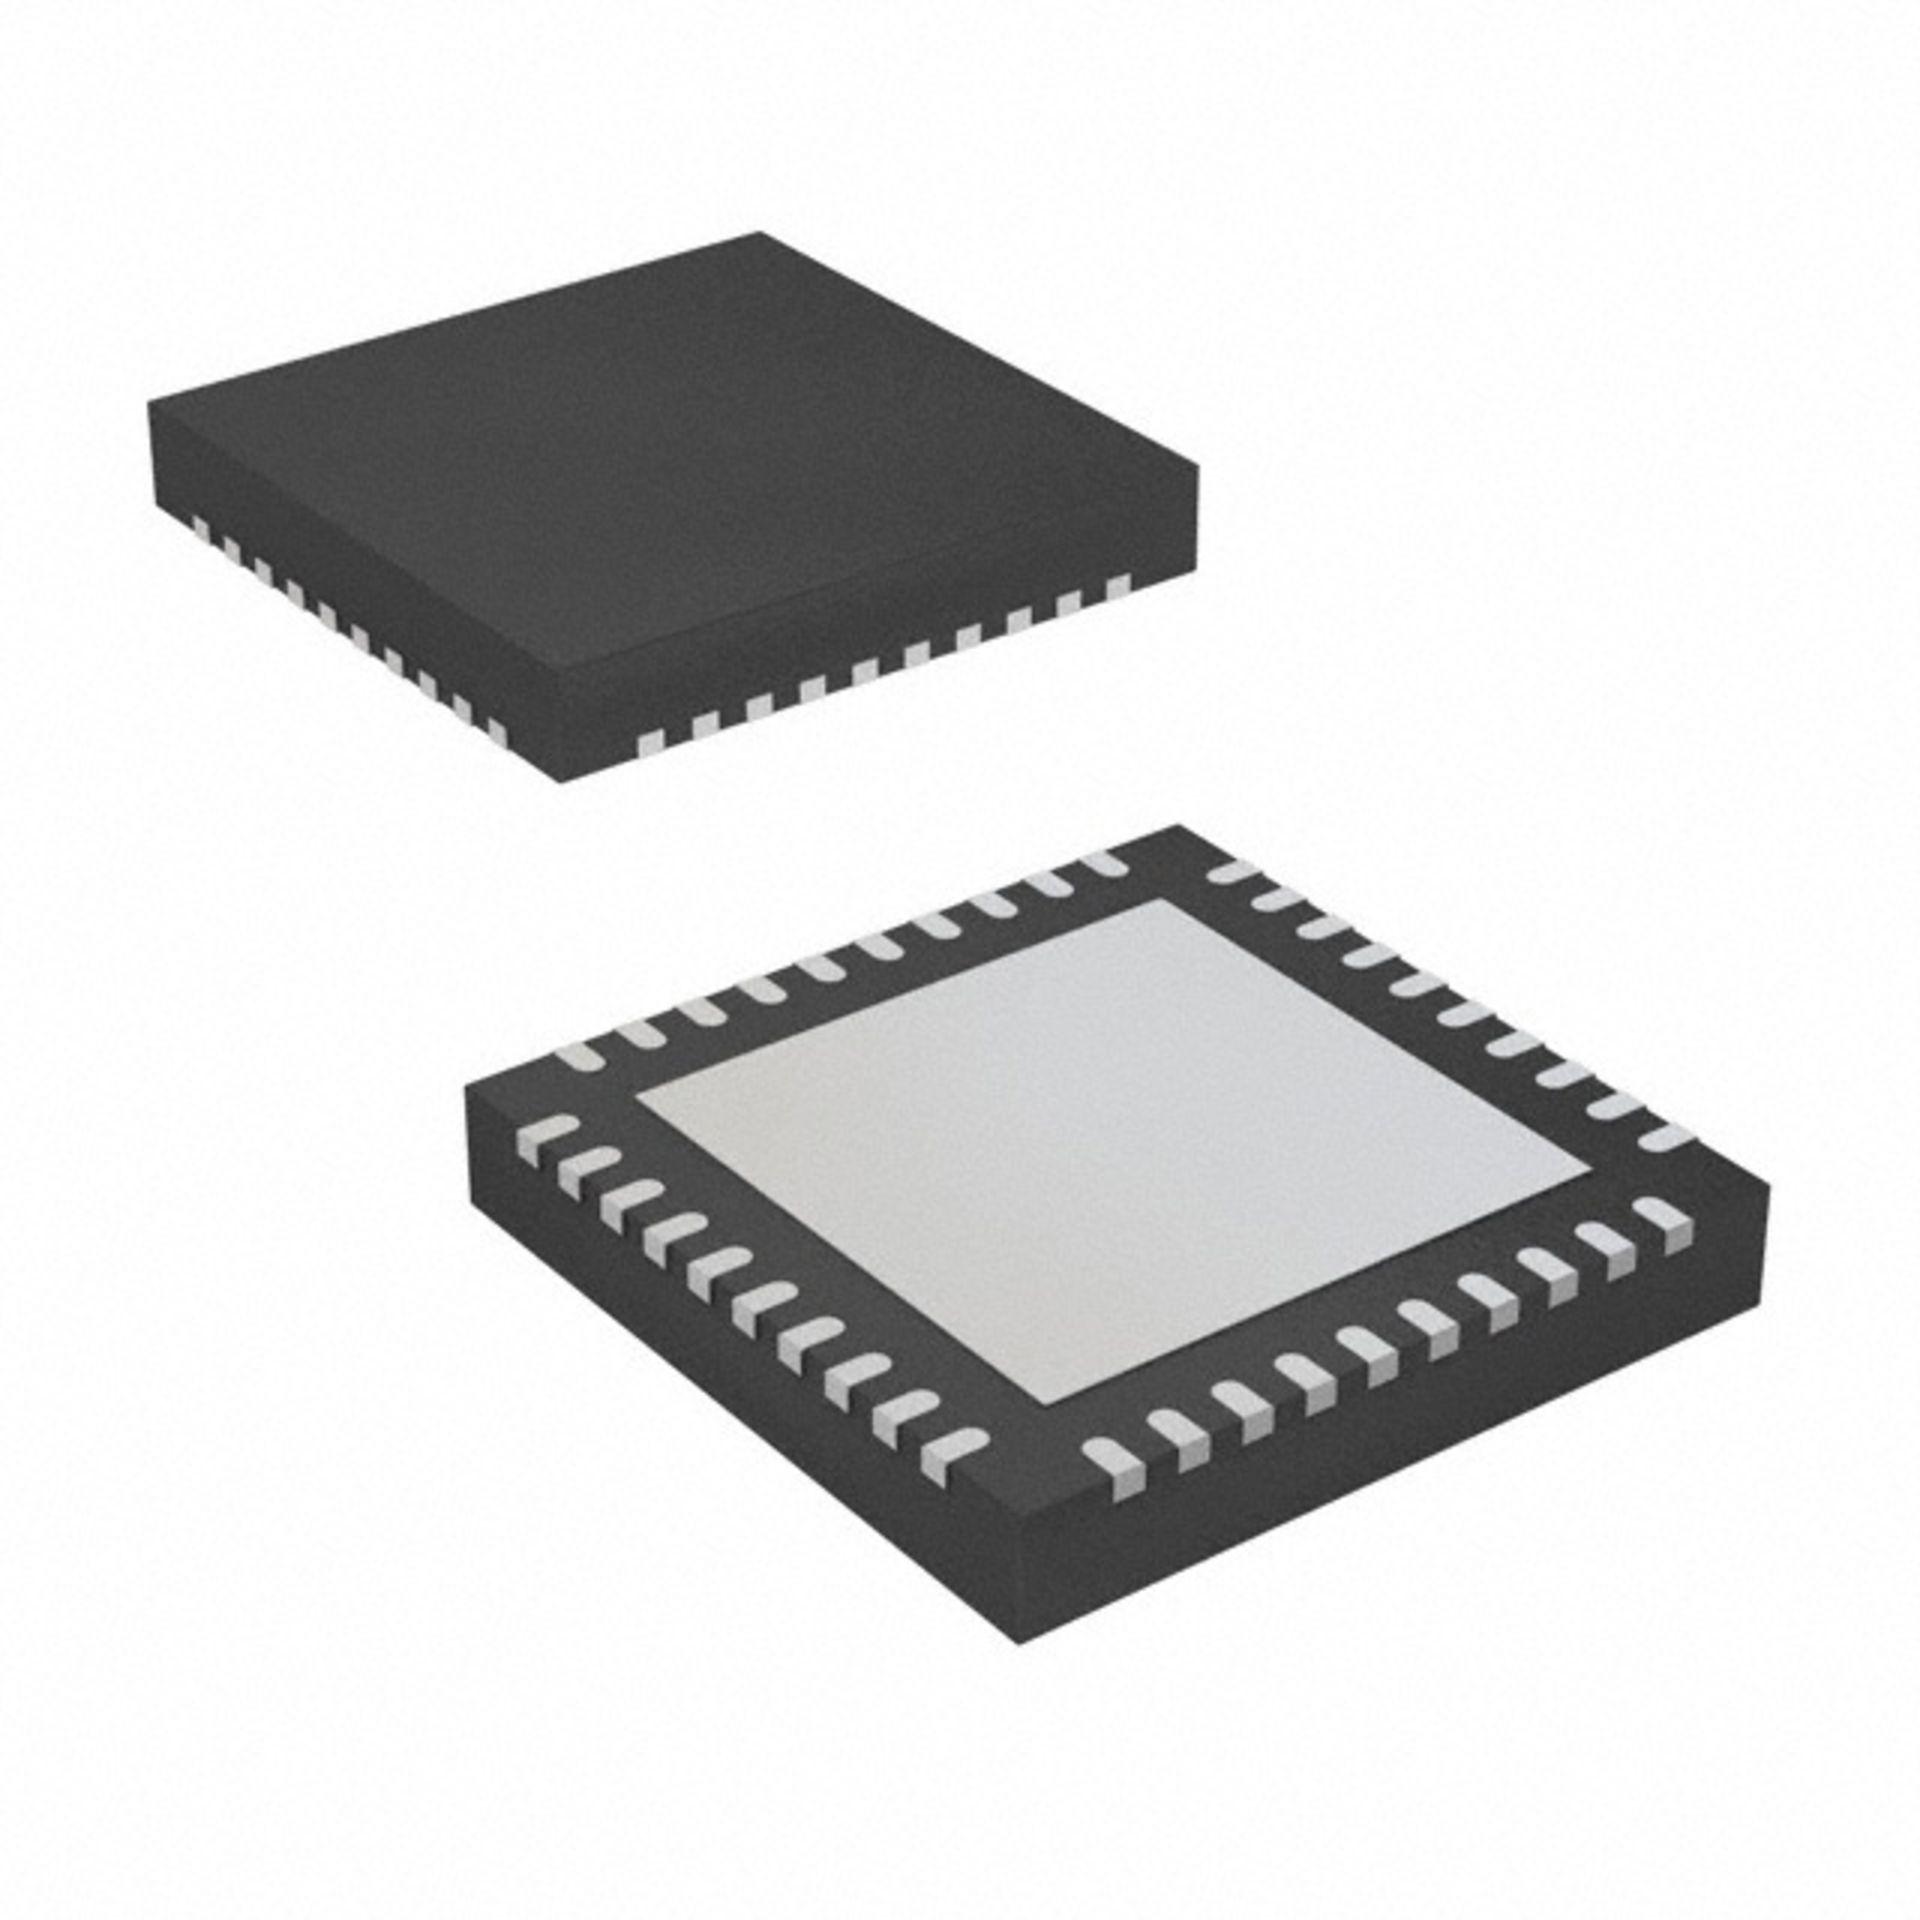 Renesas Electronics 98ULPA877AKILF, IC CLOCK DRIVER 1.8V LP 40VFQFPN, Memory, DDR2 Clock Buffer/